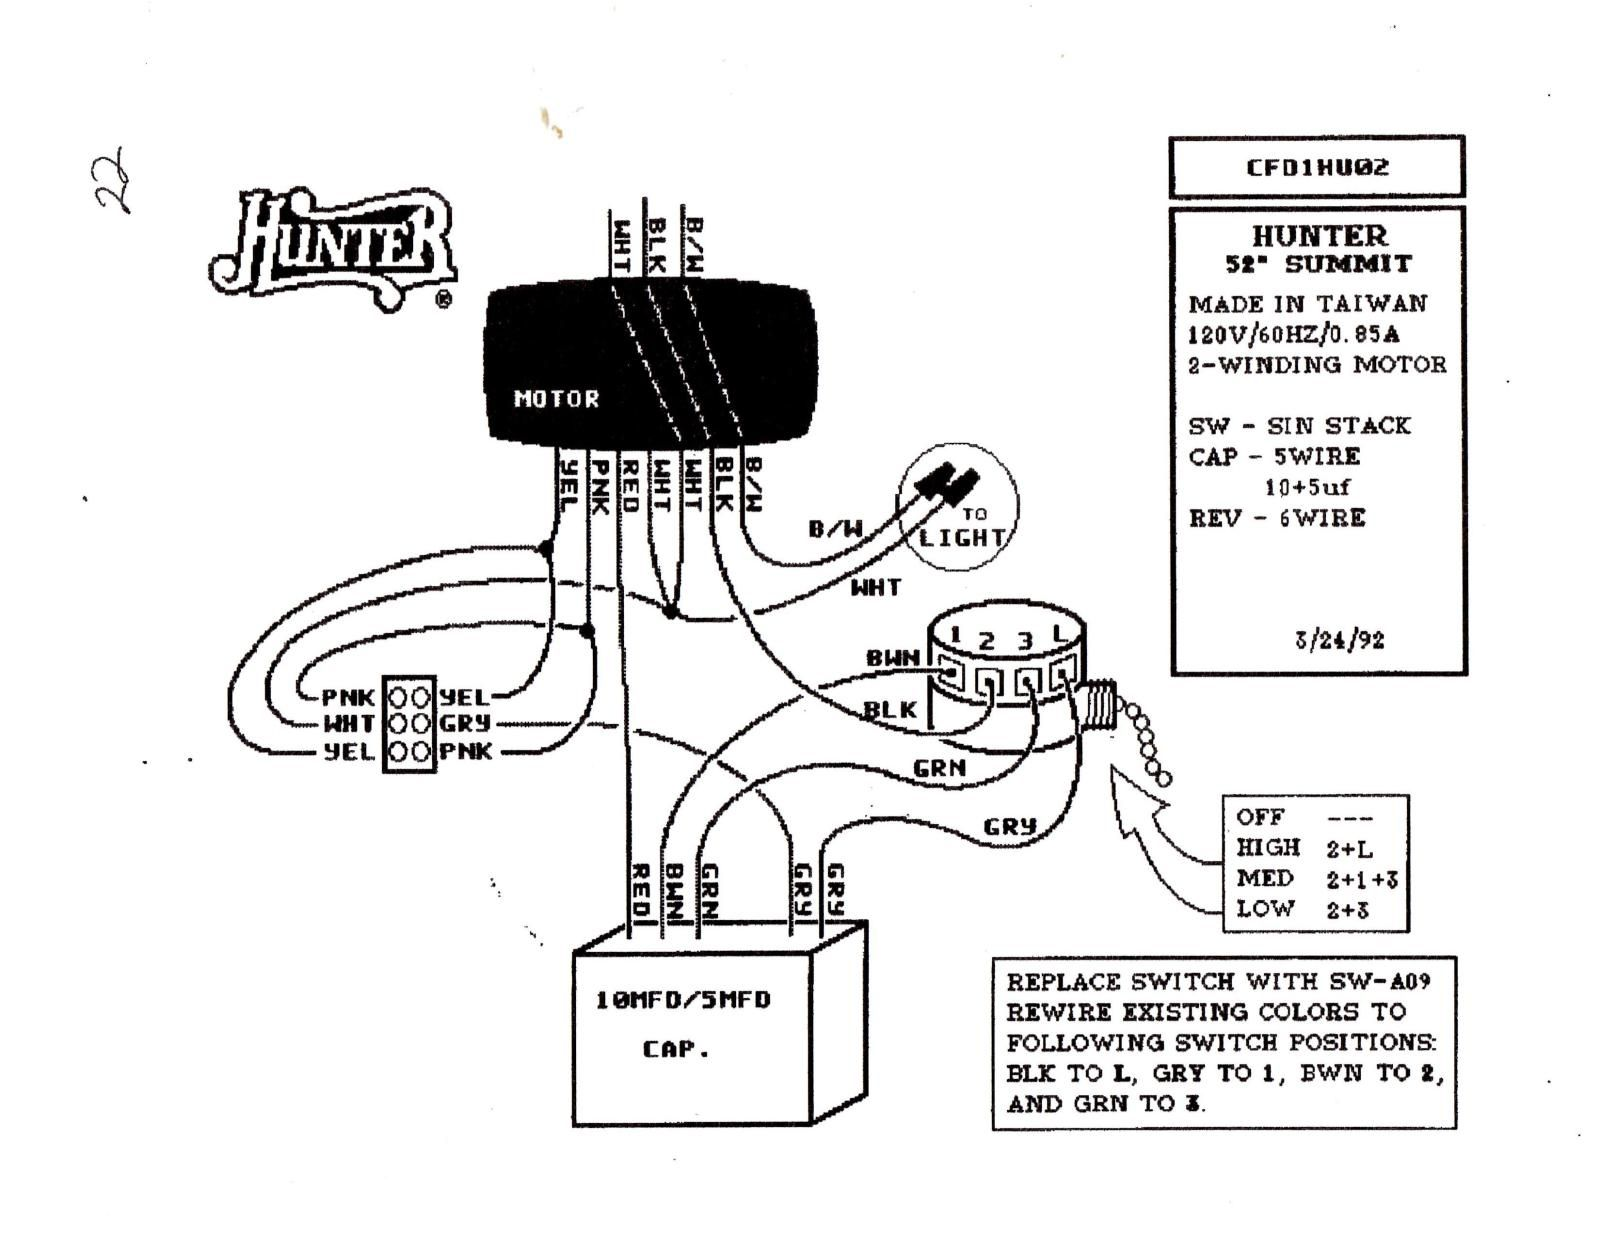 1972 Volkswagen Type 3 Wiring Diagram Trusted Diagrams Ford Ranchero Hunter Product U2022